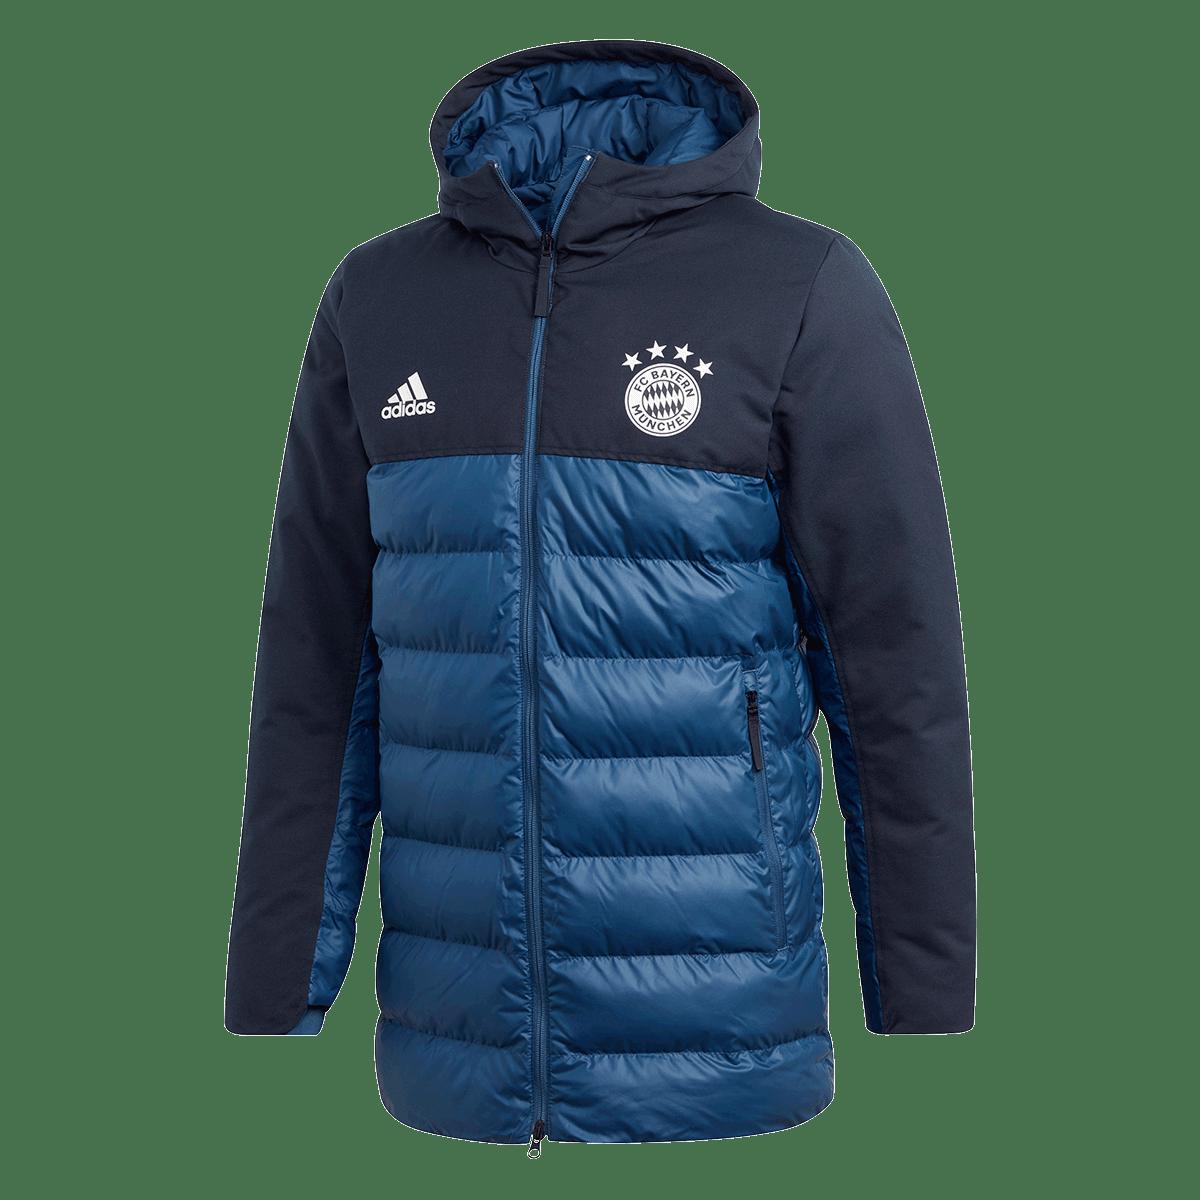 adidas FC Bayern München Kapuzenjacke S Special Padded Jacket dunkelblaublau